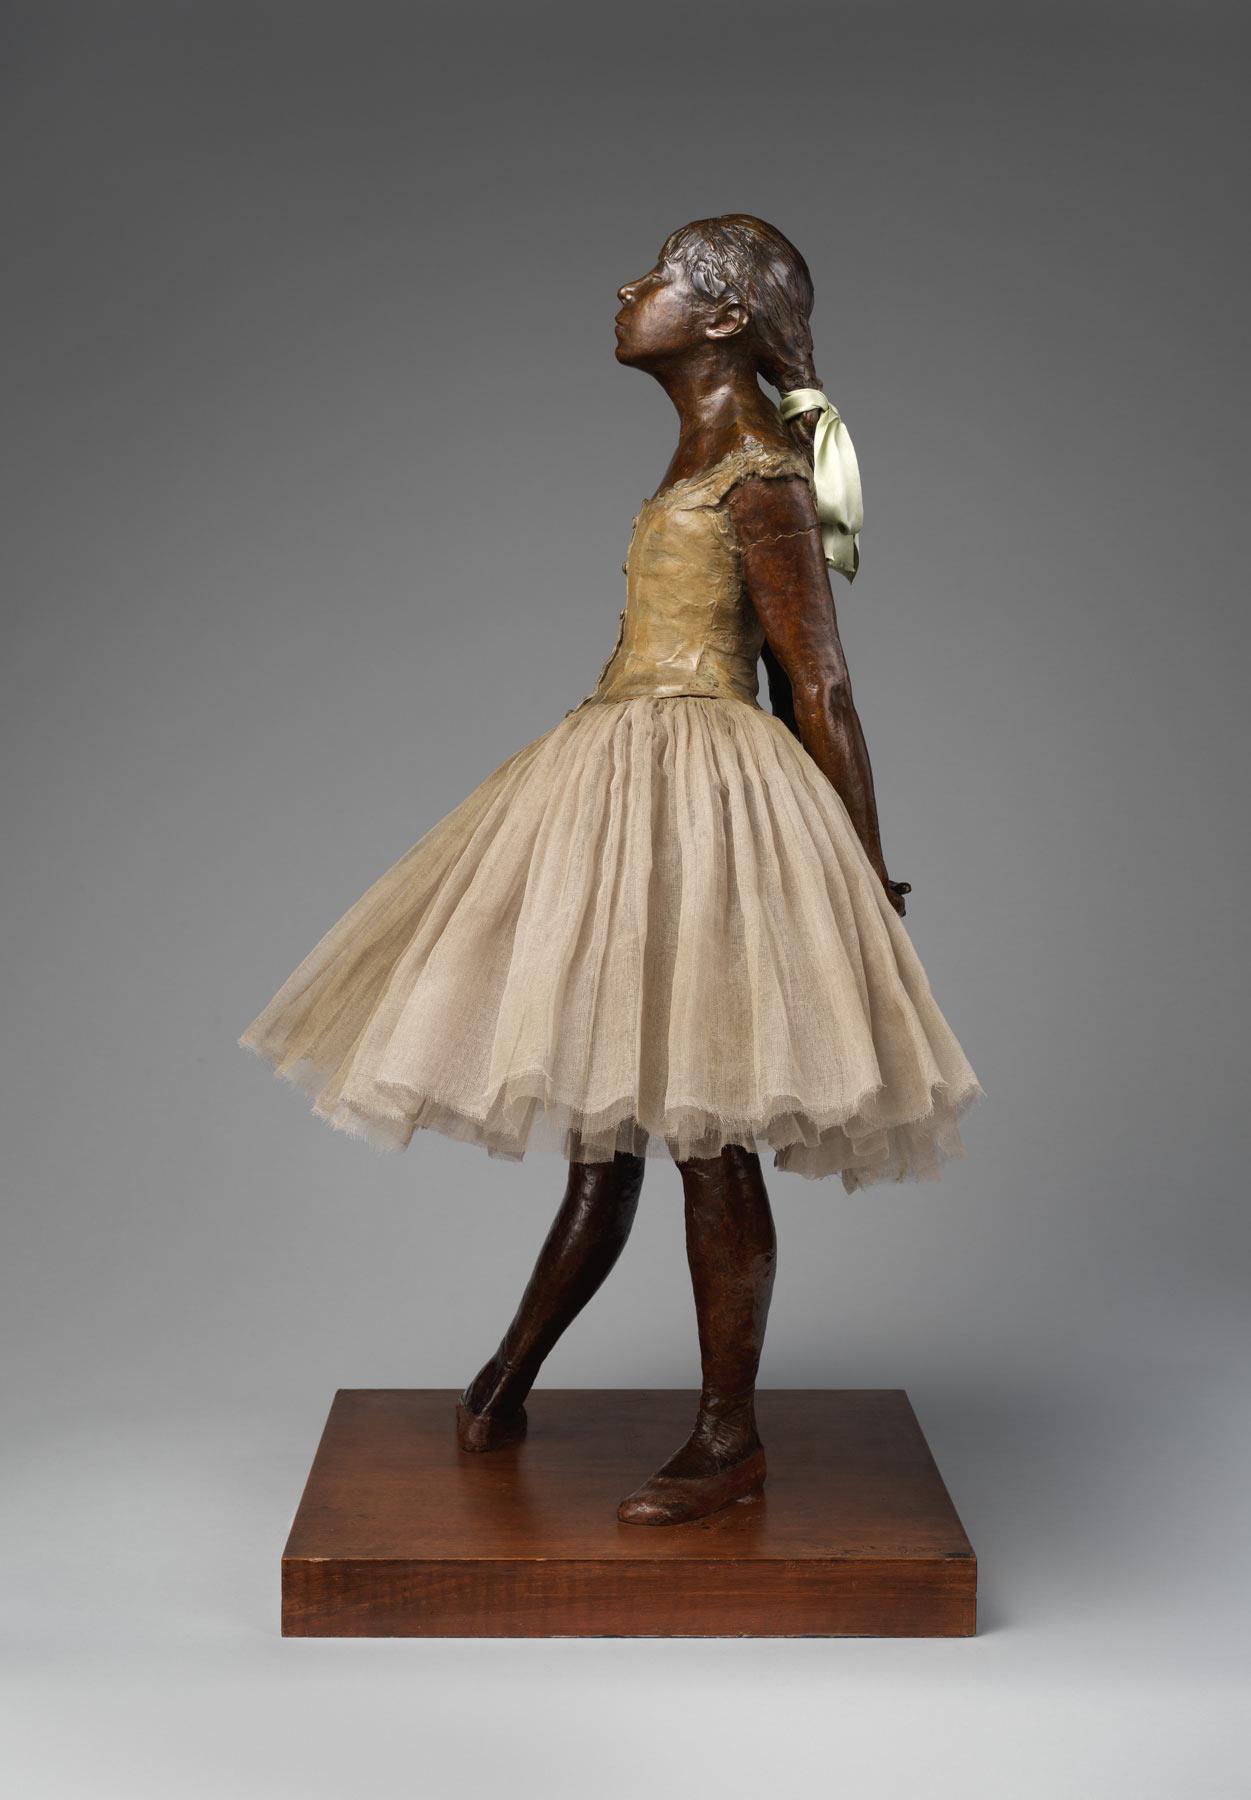 Edgar Degas, Adrien-Aurélien Hébrard, Piccola ballerina di quattordici anni (1922; bronzo, tarlatana, raso di seta, legno, 97,8 x 43,8 x 36,5 cm; New York, Metropolitan Museum)